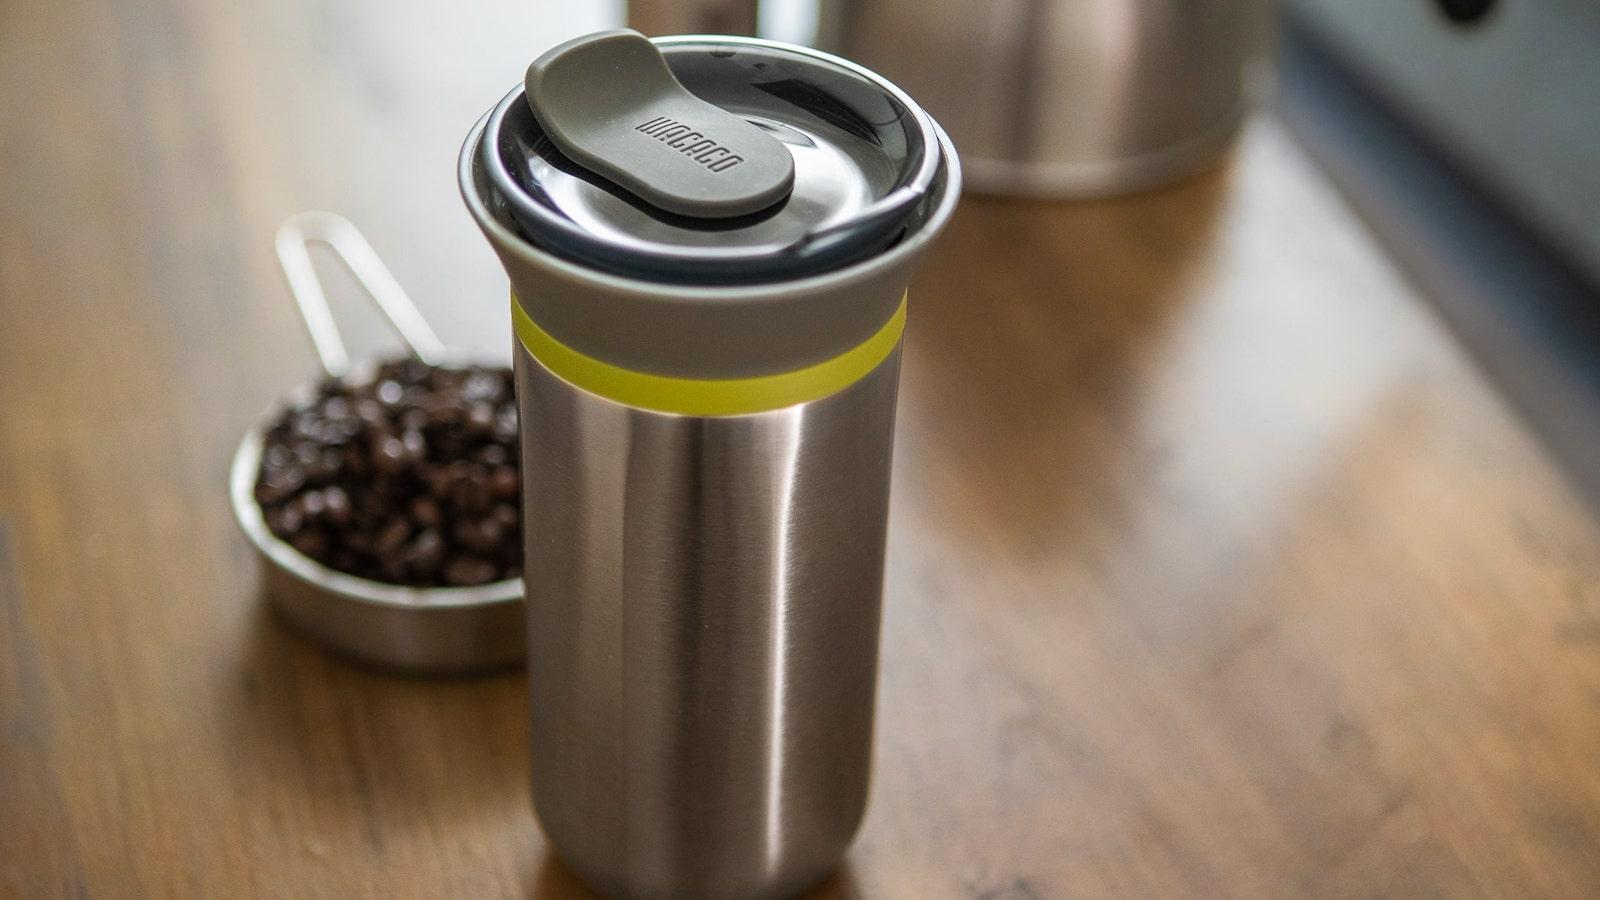 Wacaco Cuppamoka Travel Drip Coffee Maker